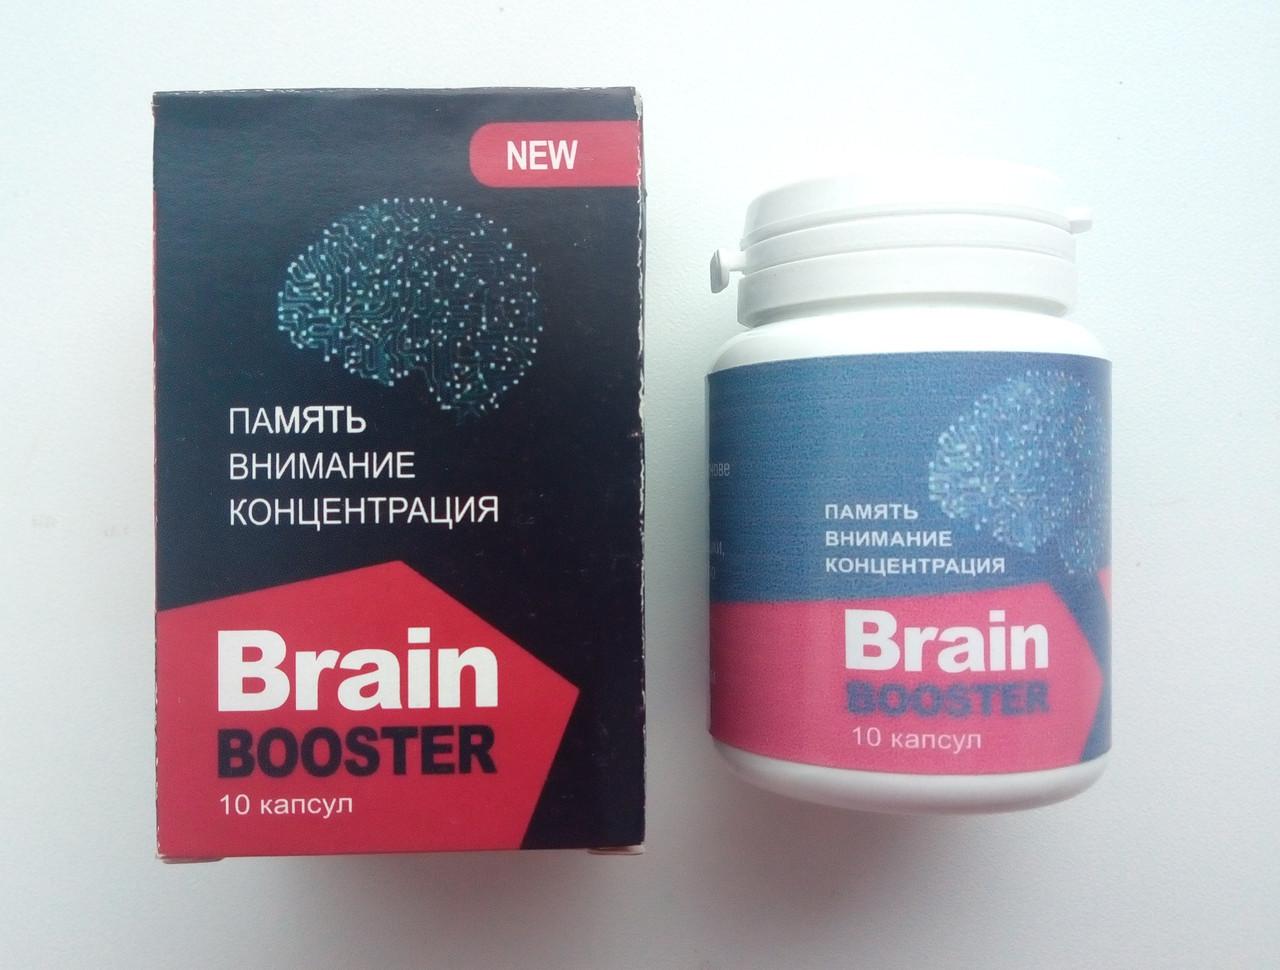 BrainBoosterX - Таблетки для улучшения памяти, внимания, концентрации (БрэйнБустер) ViP